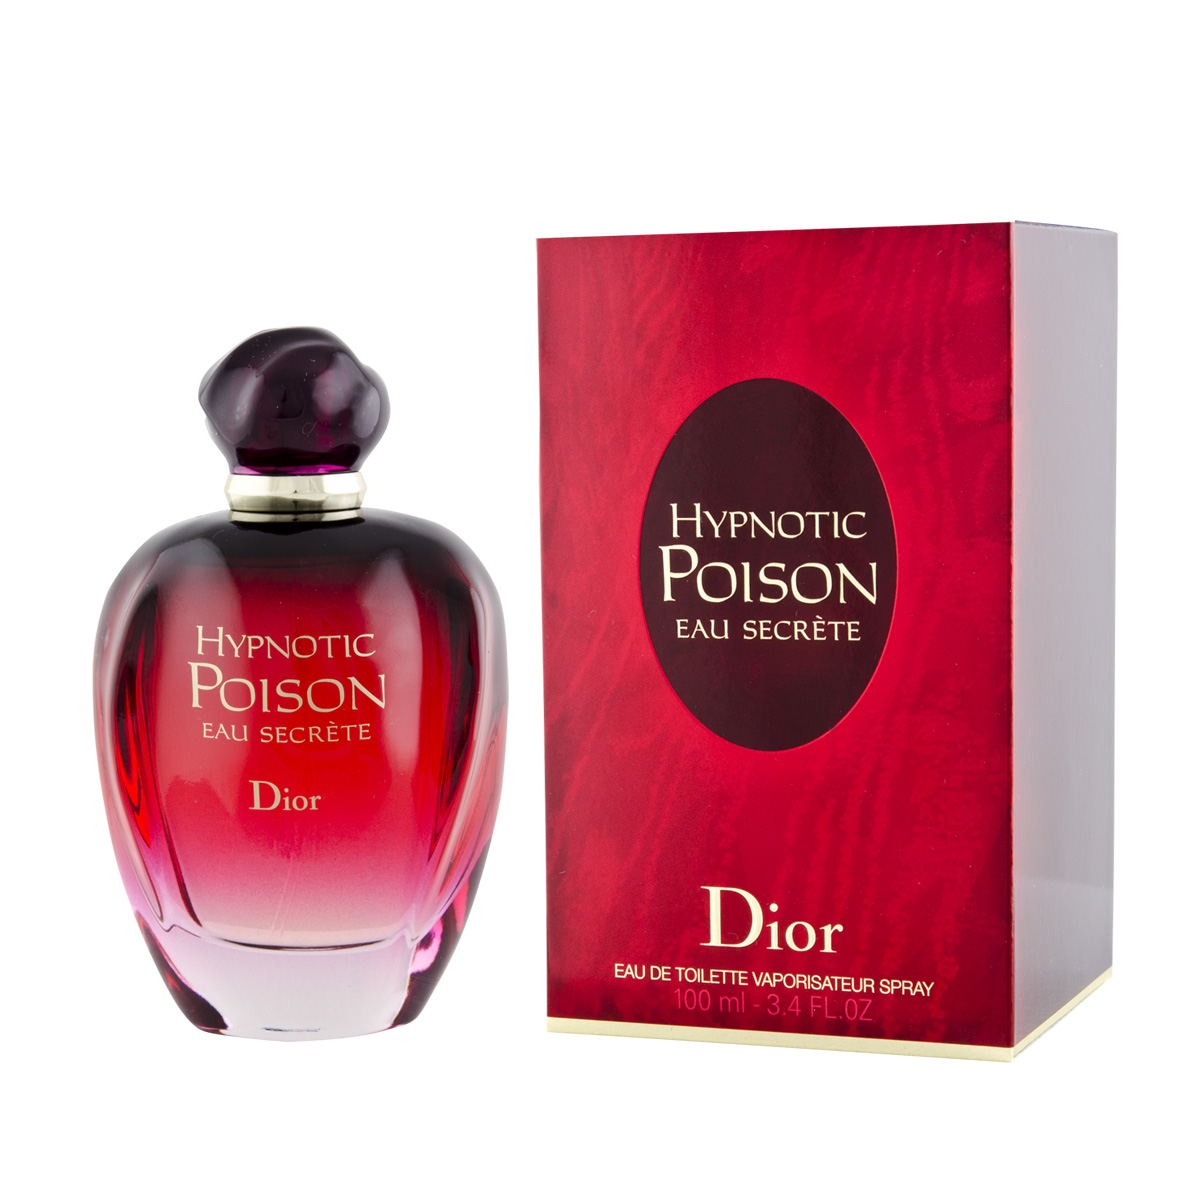 Dior Christian Hypnotic Poison Eau Secrete EDT 100 ml W